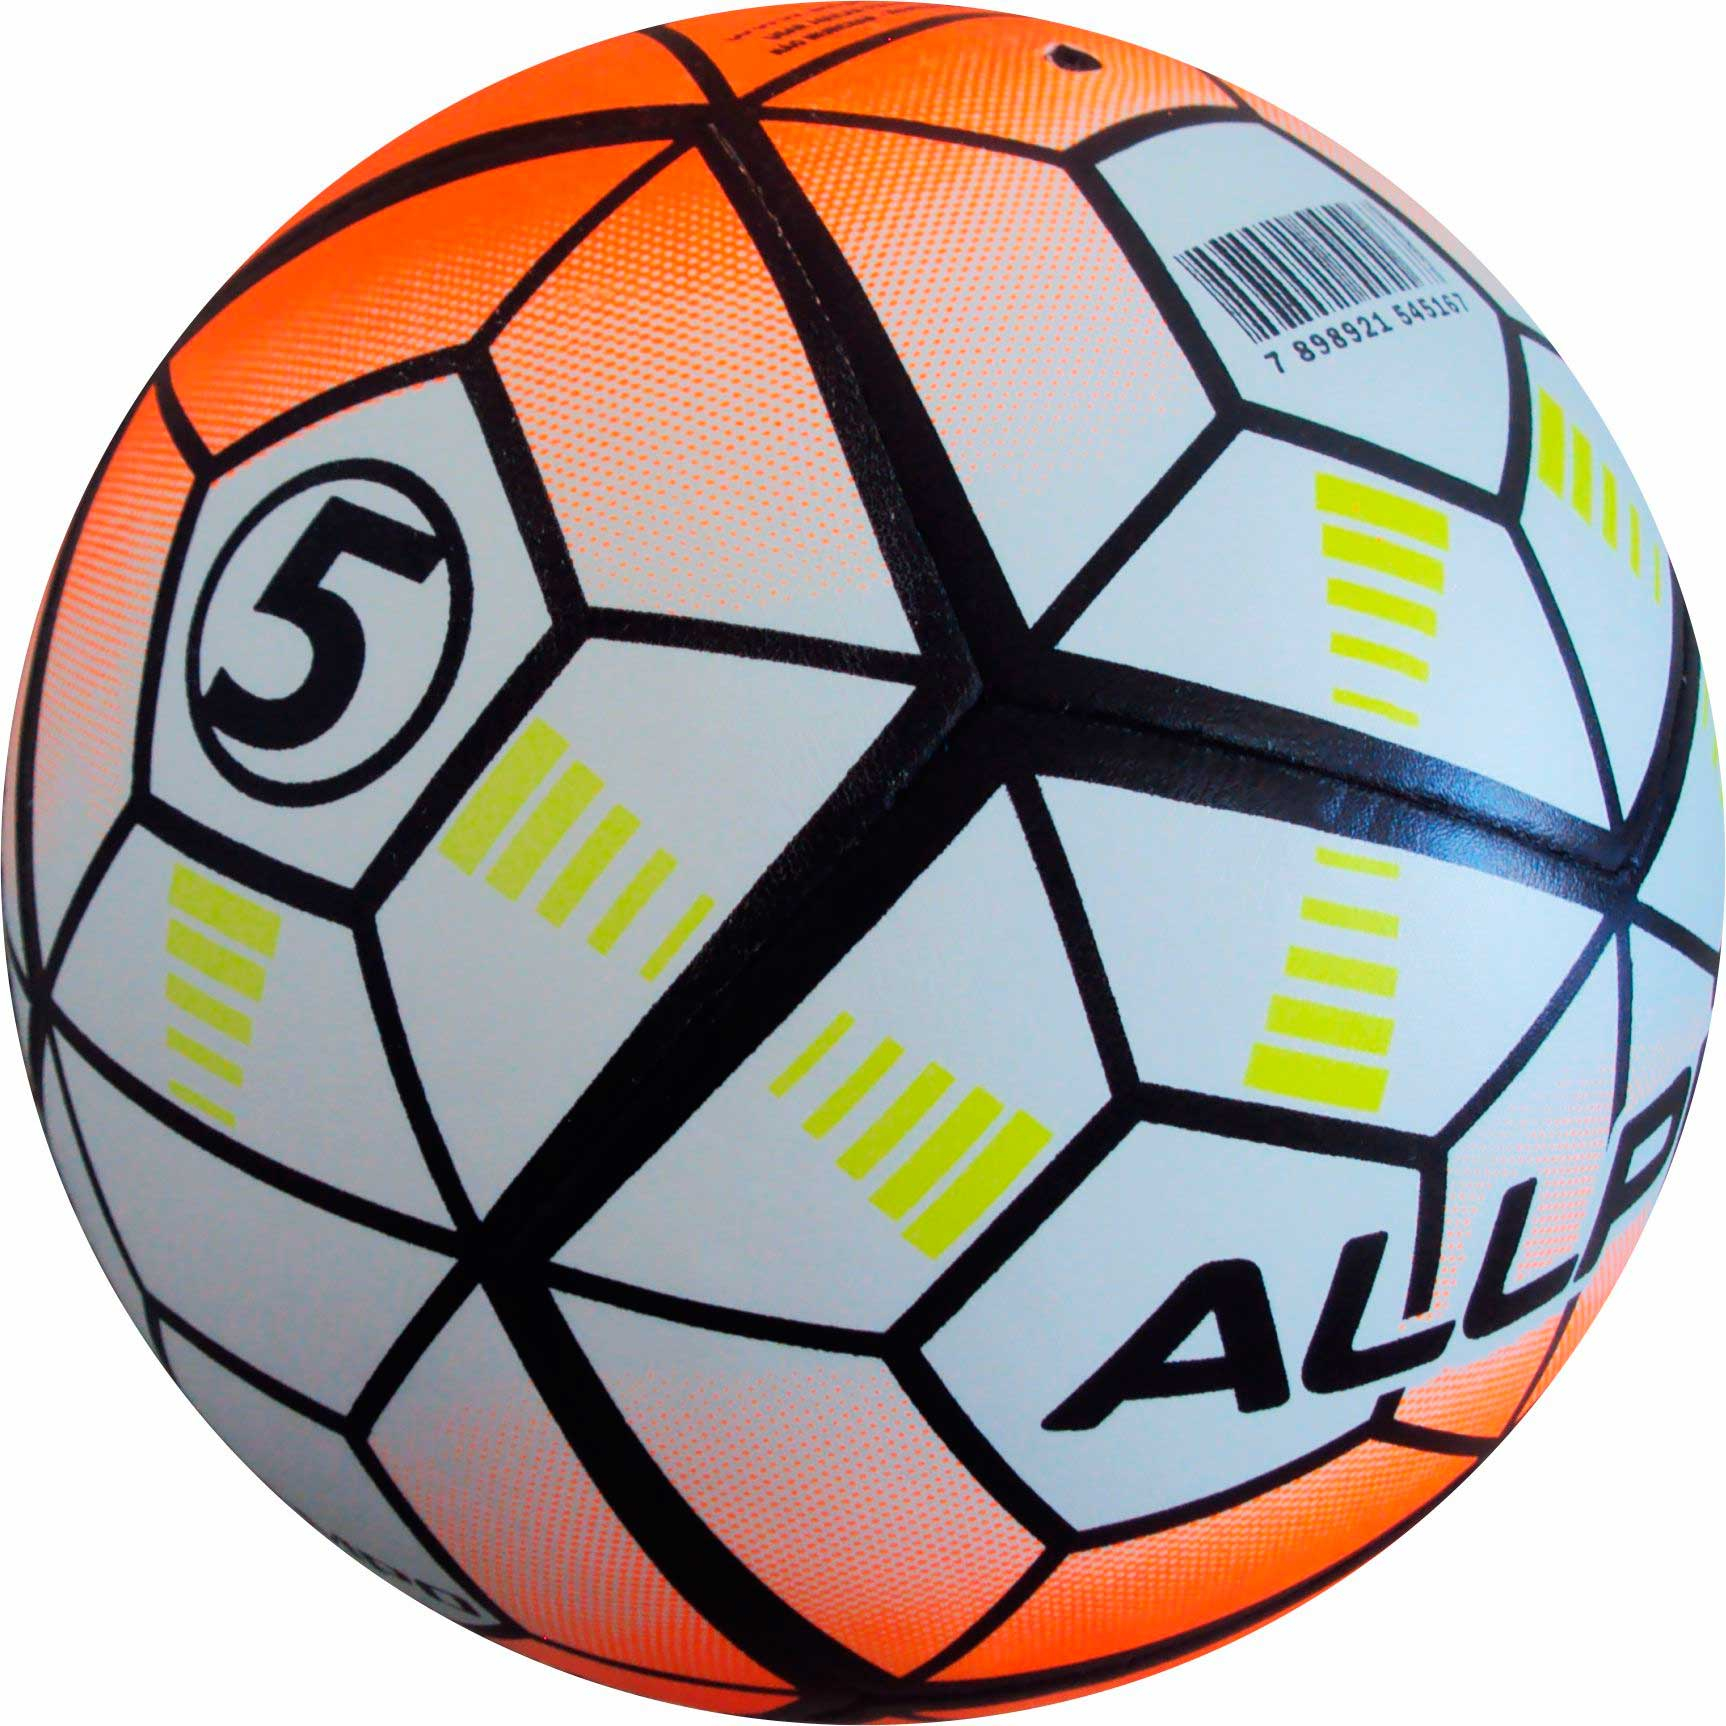 Bola de Futebol de Campo Semi Oficial Nº5 - Ref. 237 - Allpha